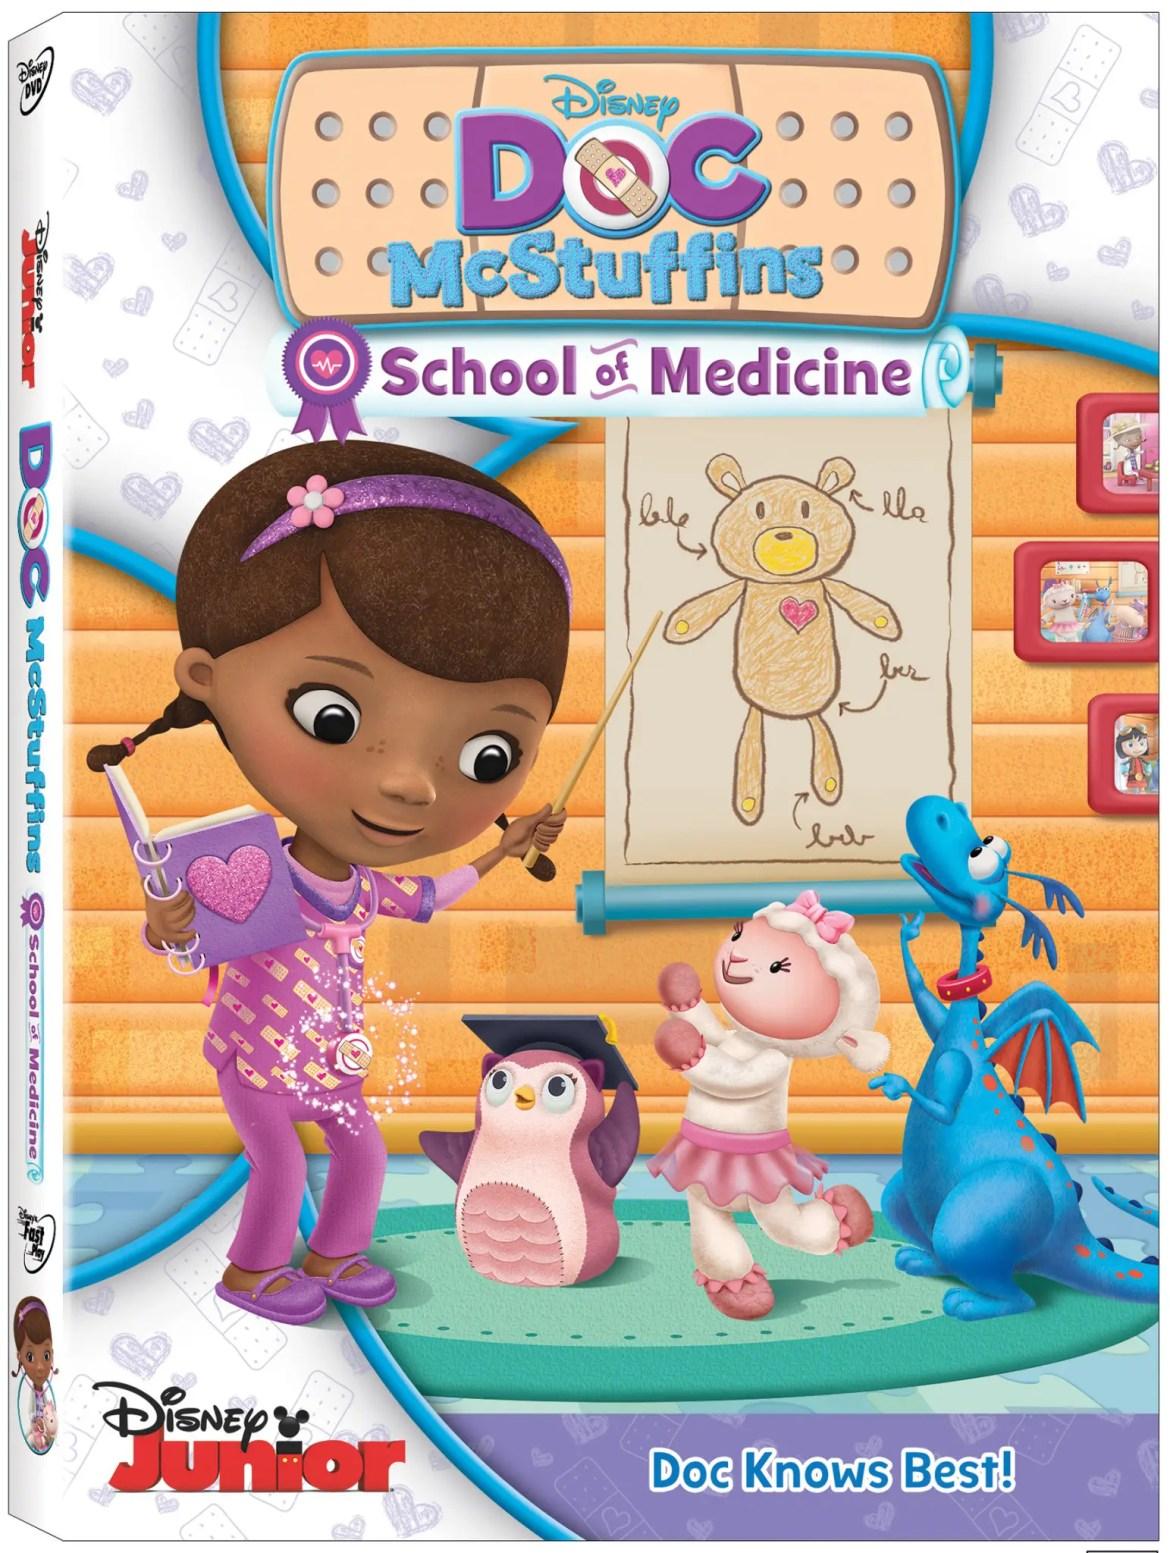 New on DVD, Doc McStuffins: School of Medicine